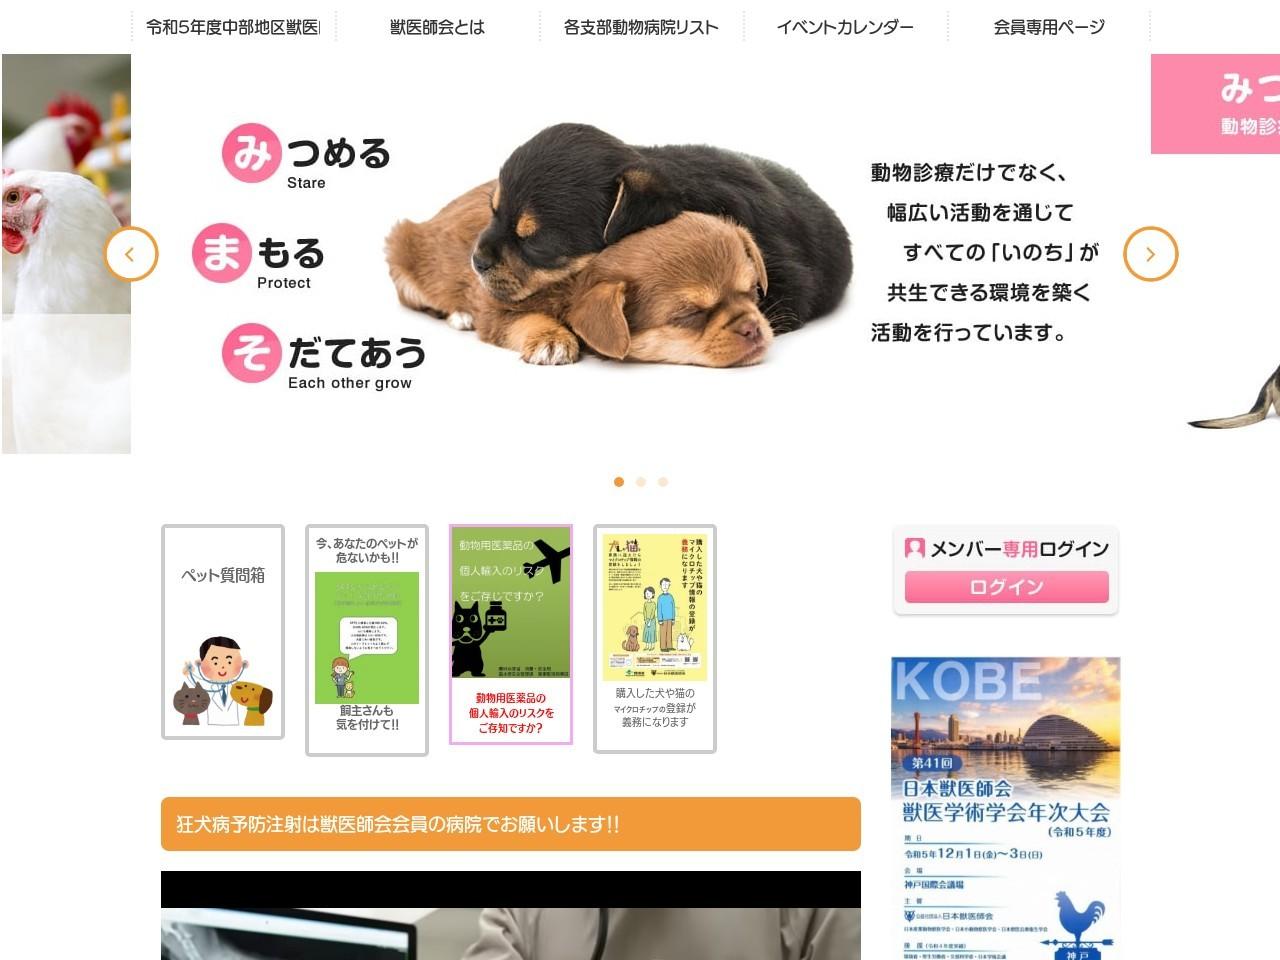 http://www.shizujyu.com